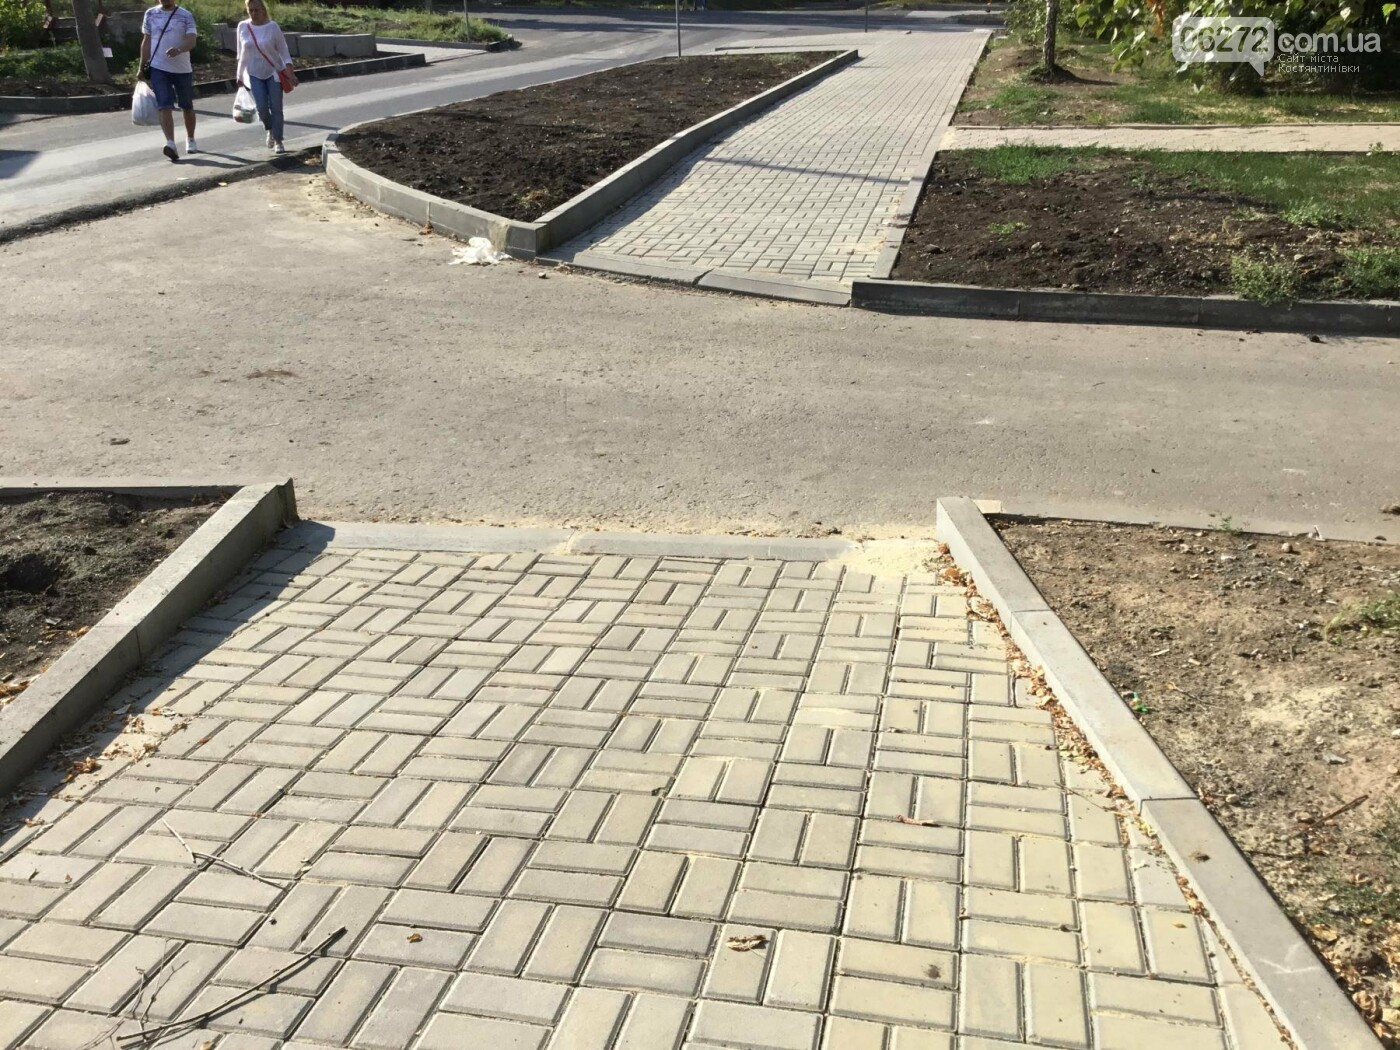 Дорога после ремонта по ул. Леваневского в Константиновке, фото-24